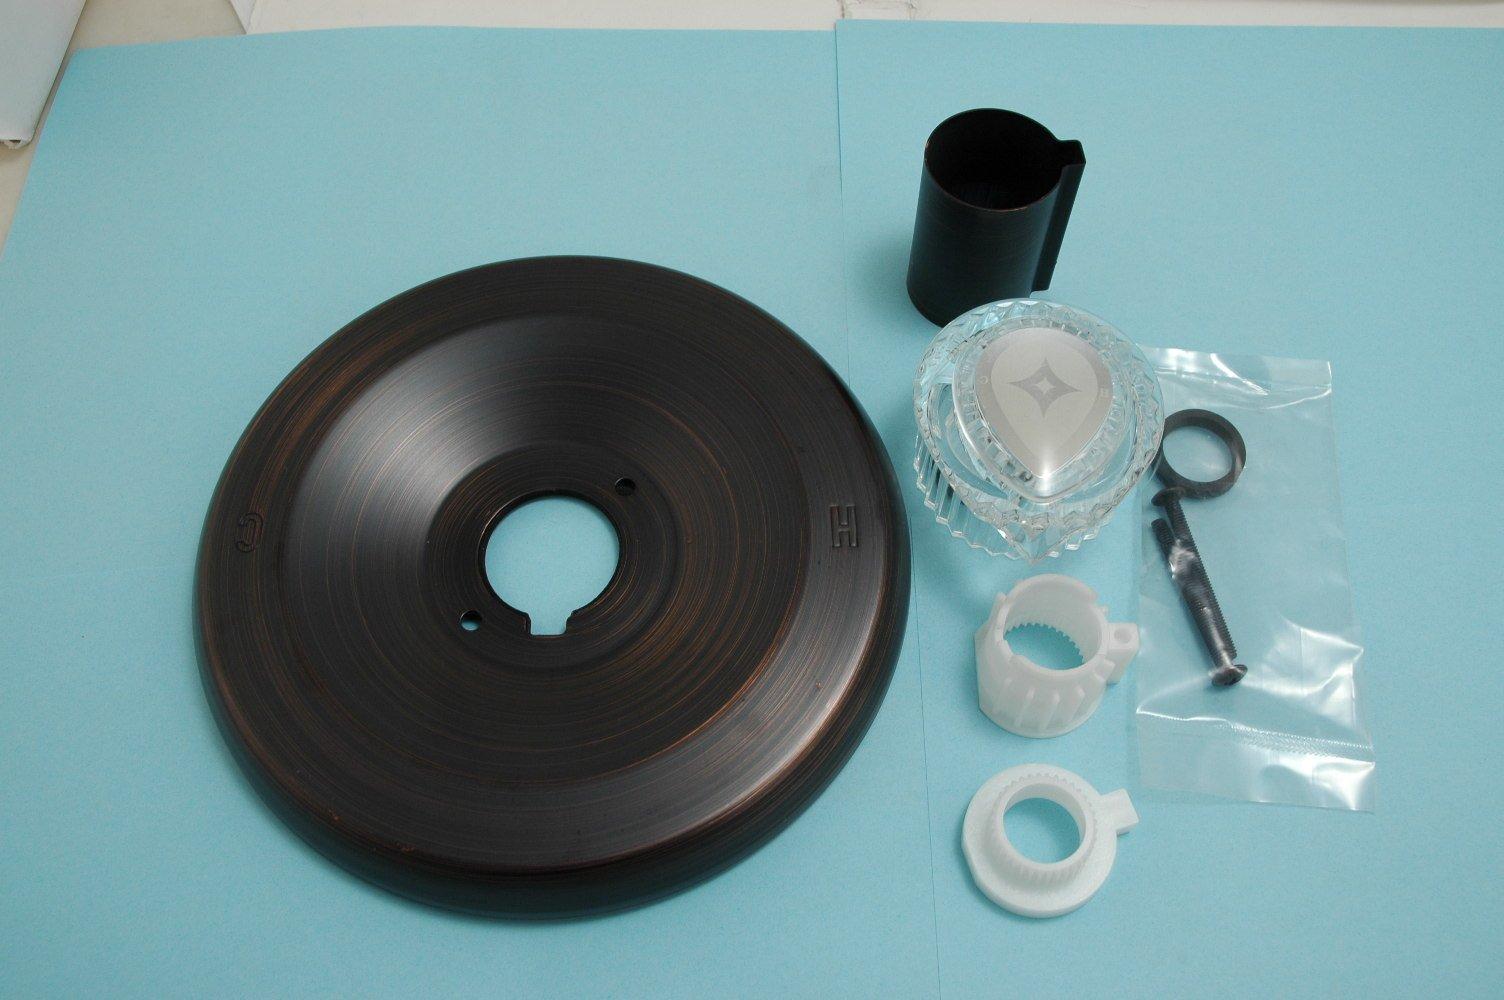 Trim Kit Fits Moen ''Posi-Temp'' Series 2300 Tub & Shower Faucet, Oil Rubbed Bronzed Finish - By Plumb USA 32347BOB